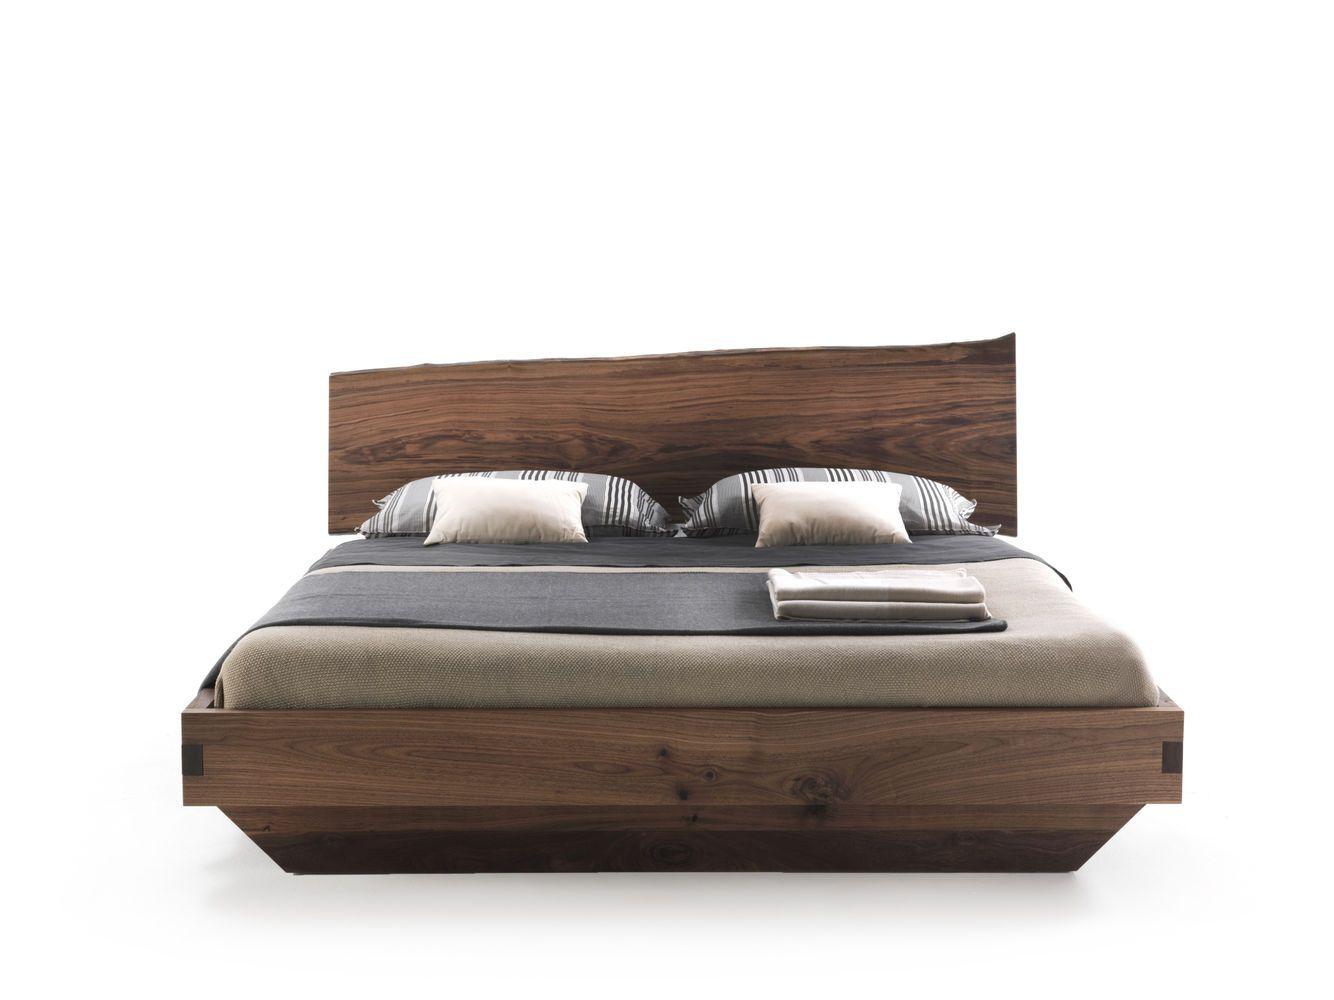 New version of riva us natura series the natura bed has a